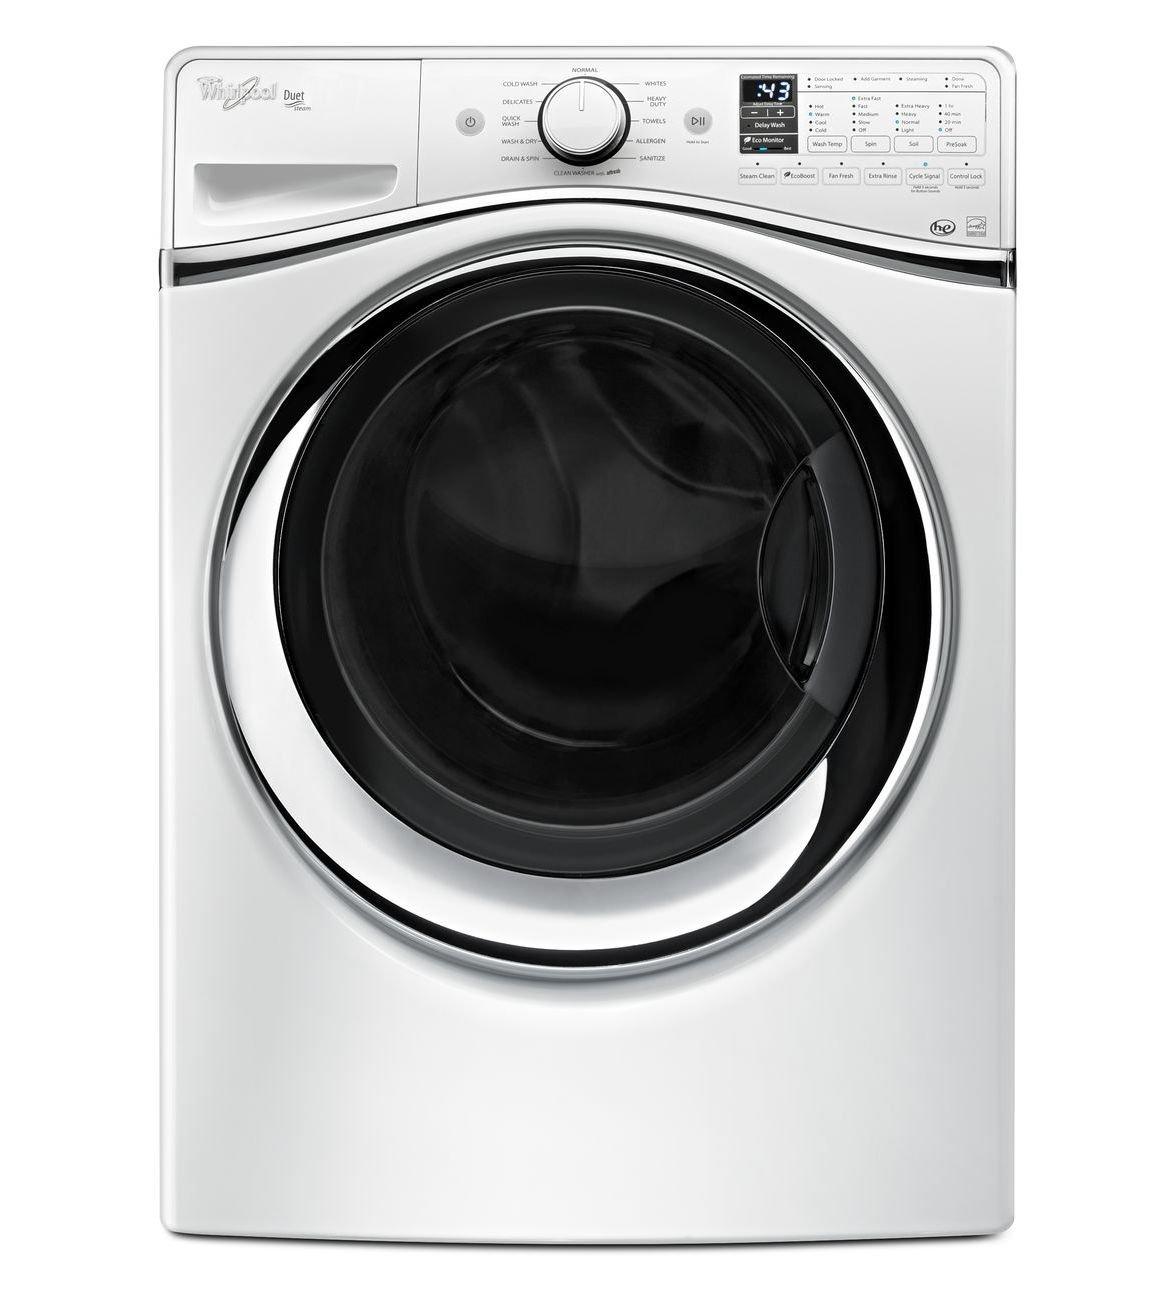 Whirlpool WFW95HEDW Independiente Carga frontal Blanco lavadora ...